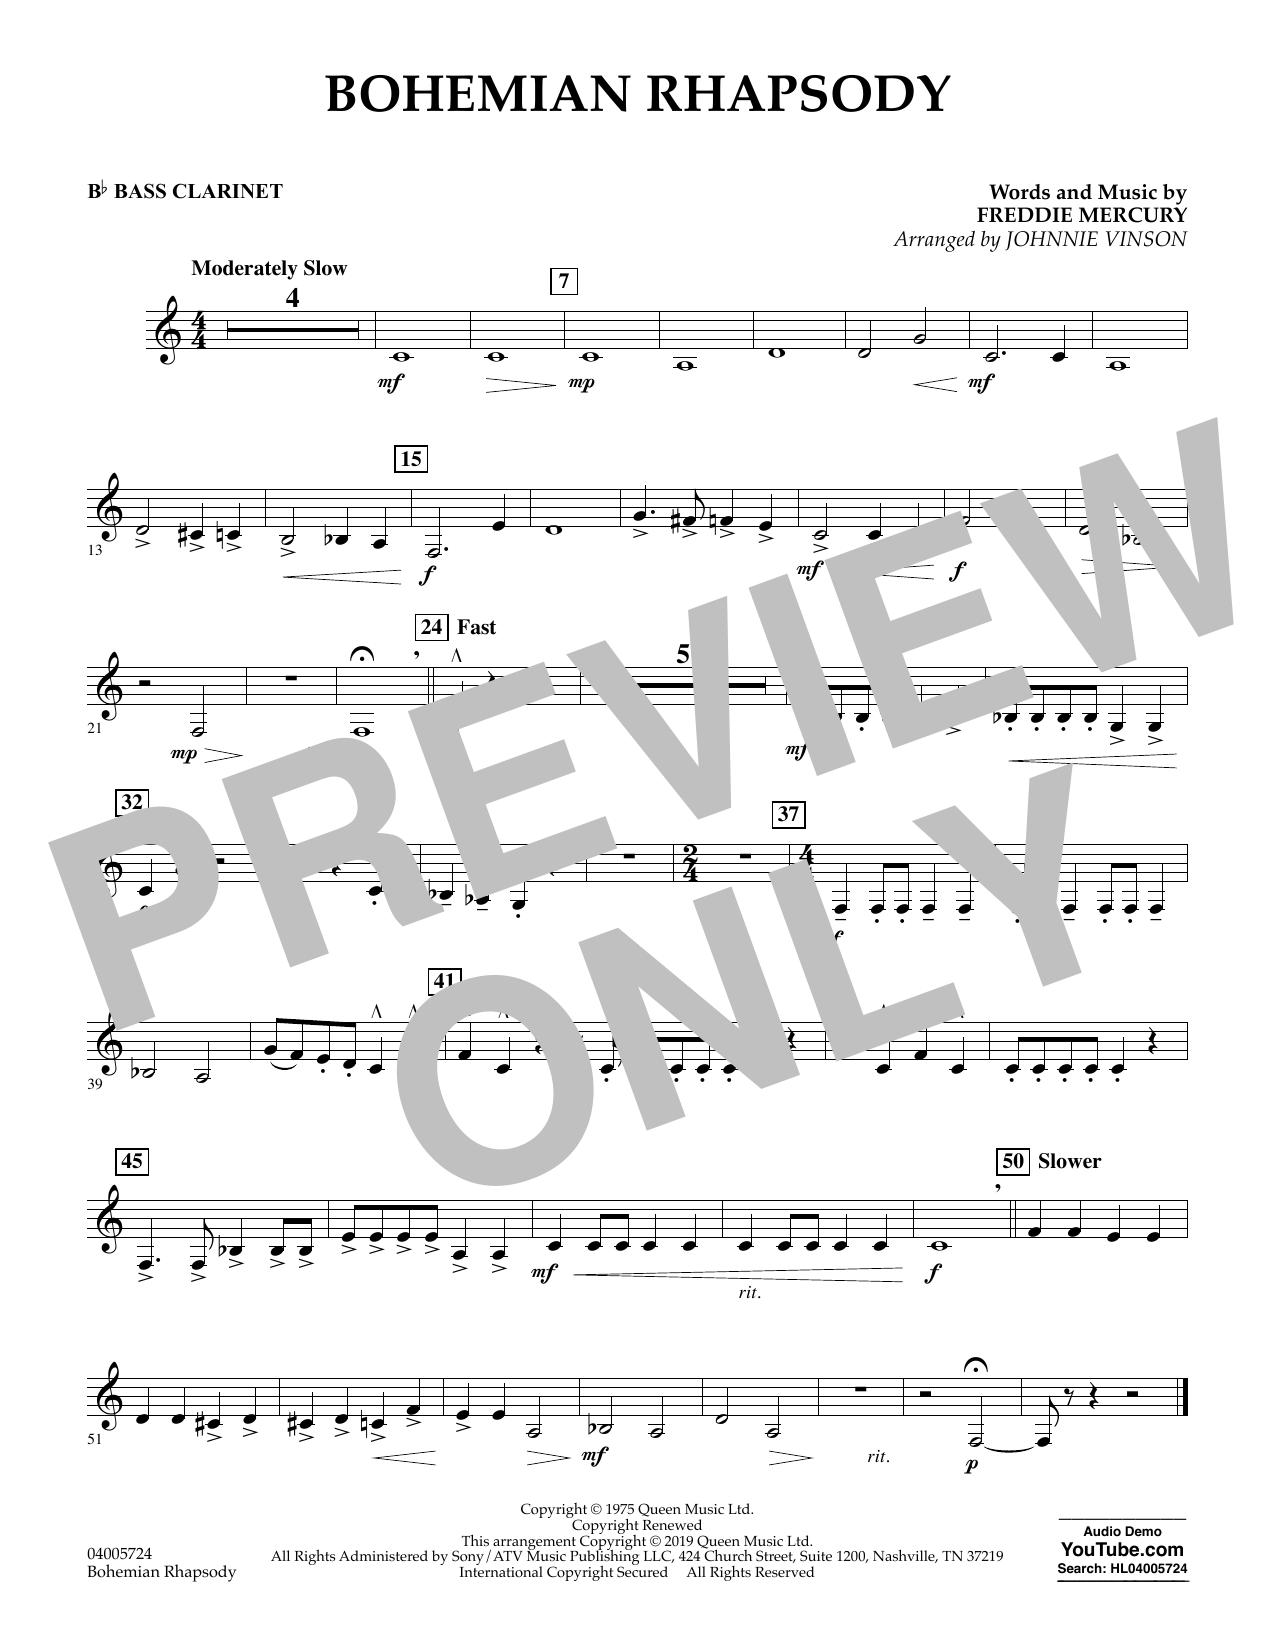 Bohemian Rhapsody (arr. Johnnie Vinson) - Bb Bass Clarinet (Concert Band)